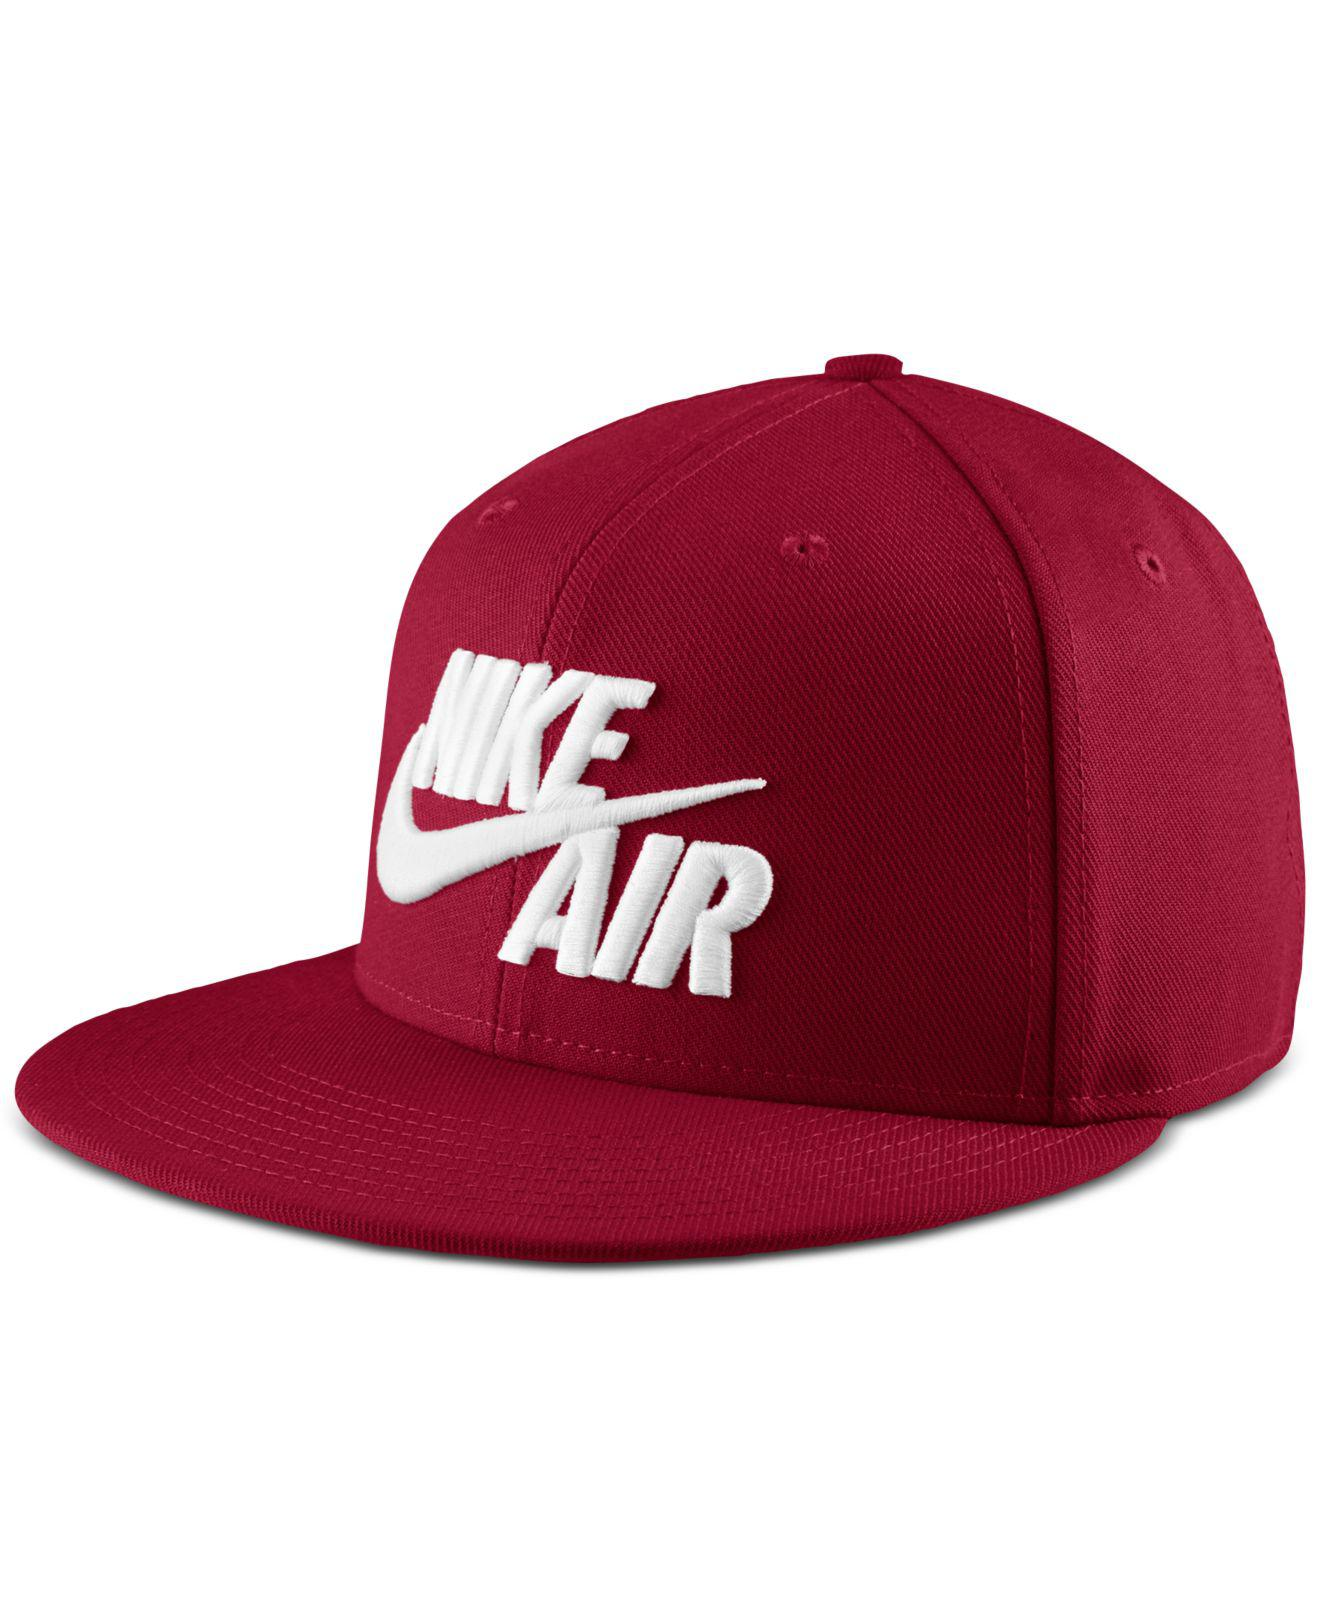 76f132397b6 Lyst - Nike Sportswear Air Dri-fit Hat in Red for Men